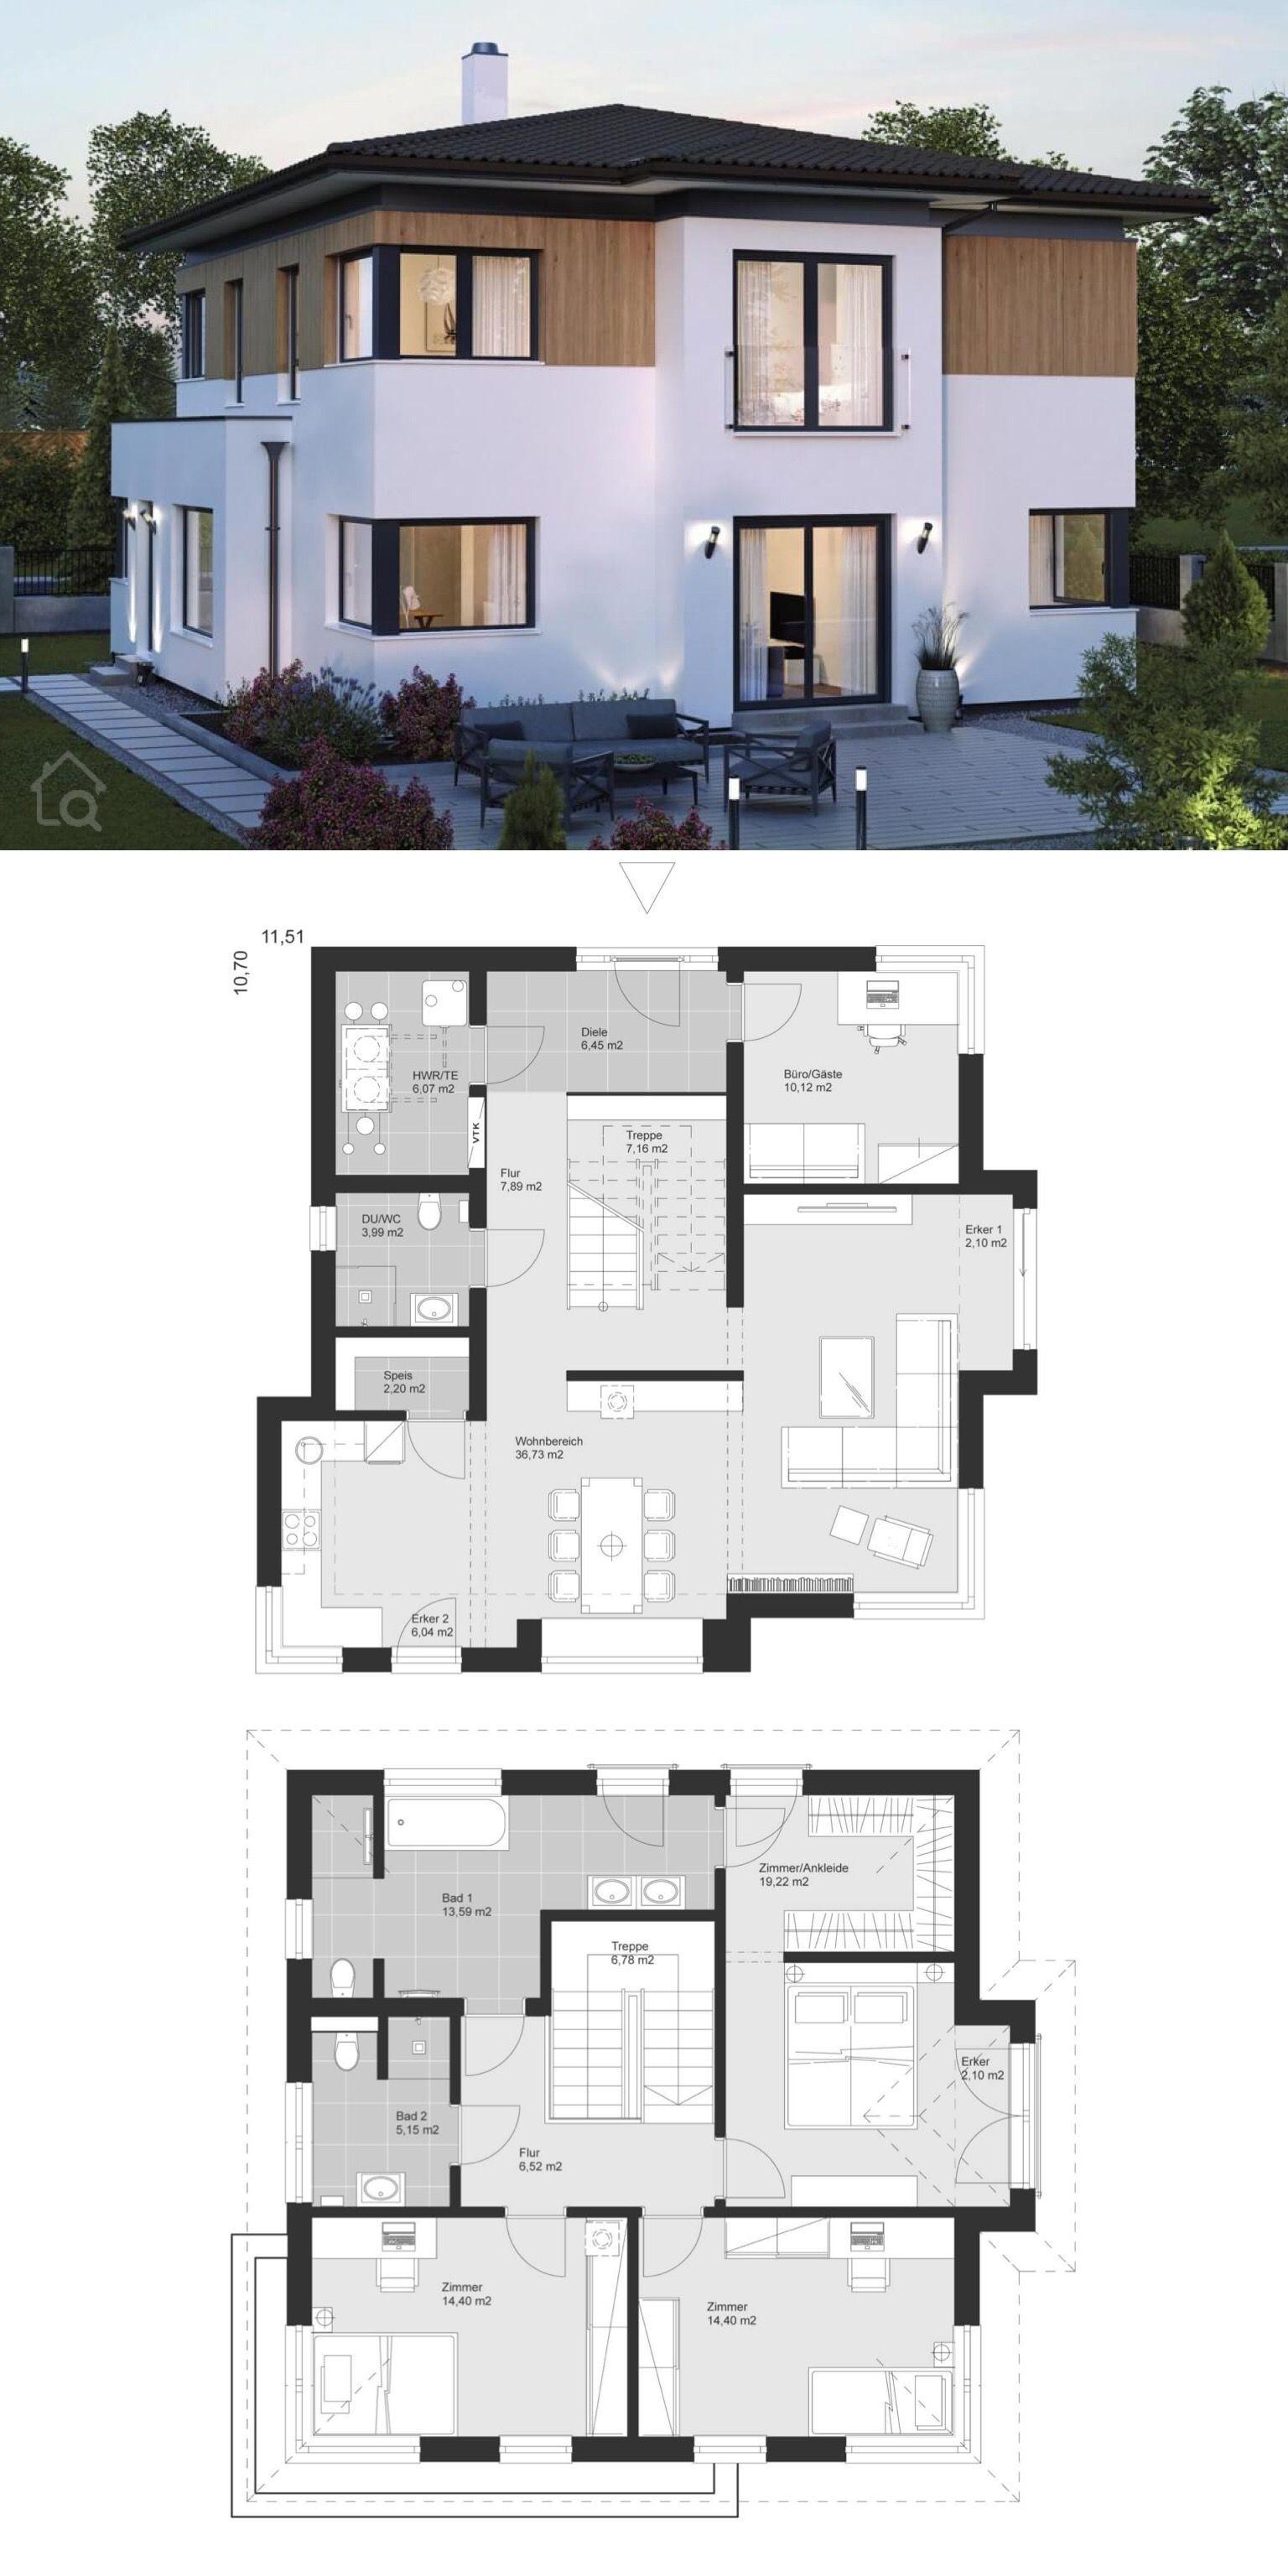 Neubau Stadtvilla Grundriss modern mit Walmdach & Holz Putz Fassade Haus Ideen